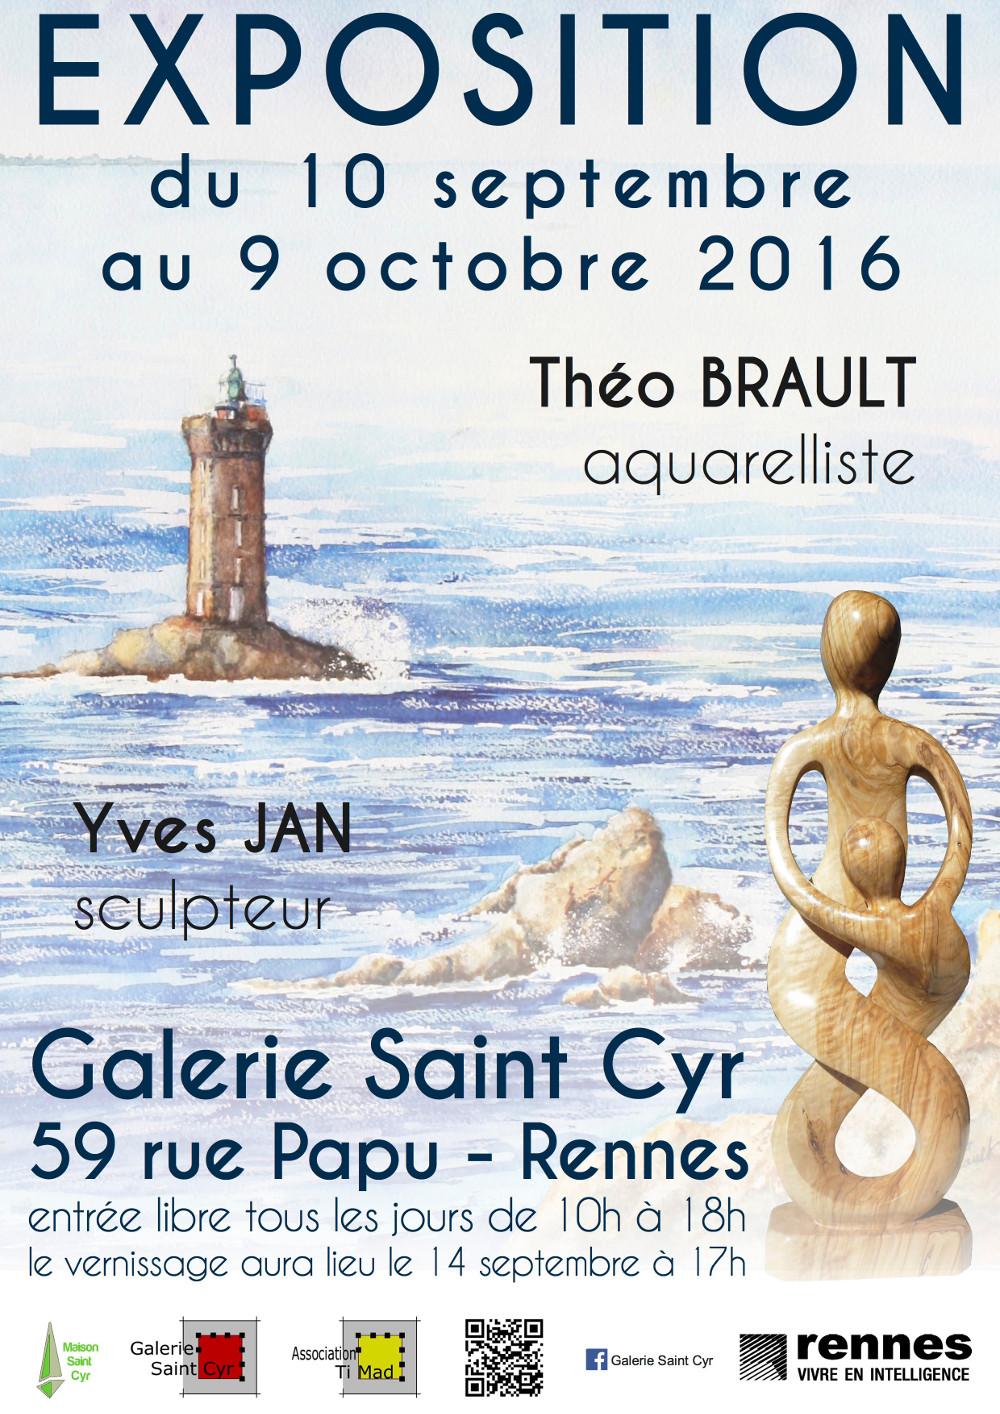 Théo Brault - Aquareliste